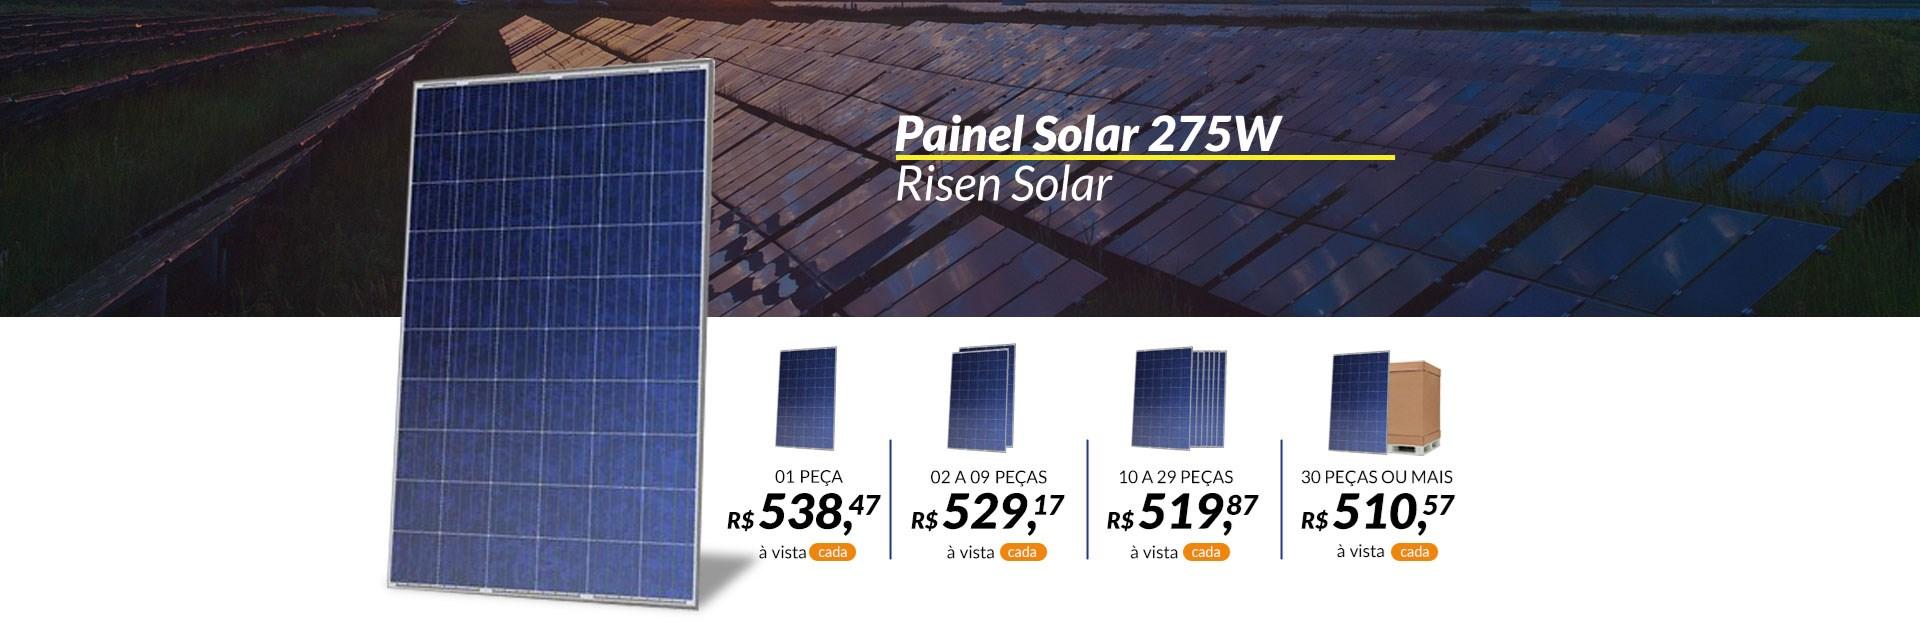 Painel Solar 275W - Risen Solar